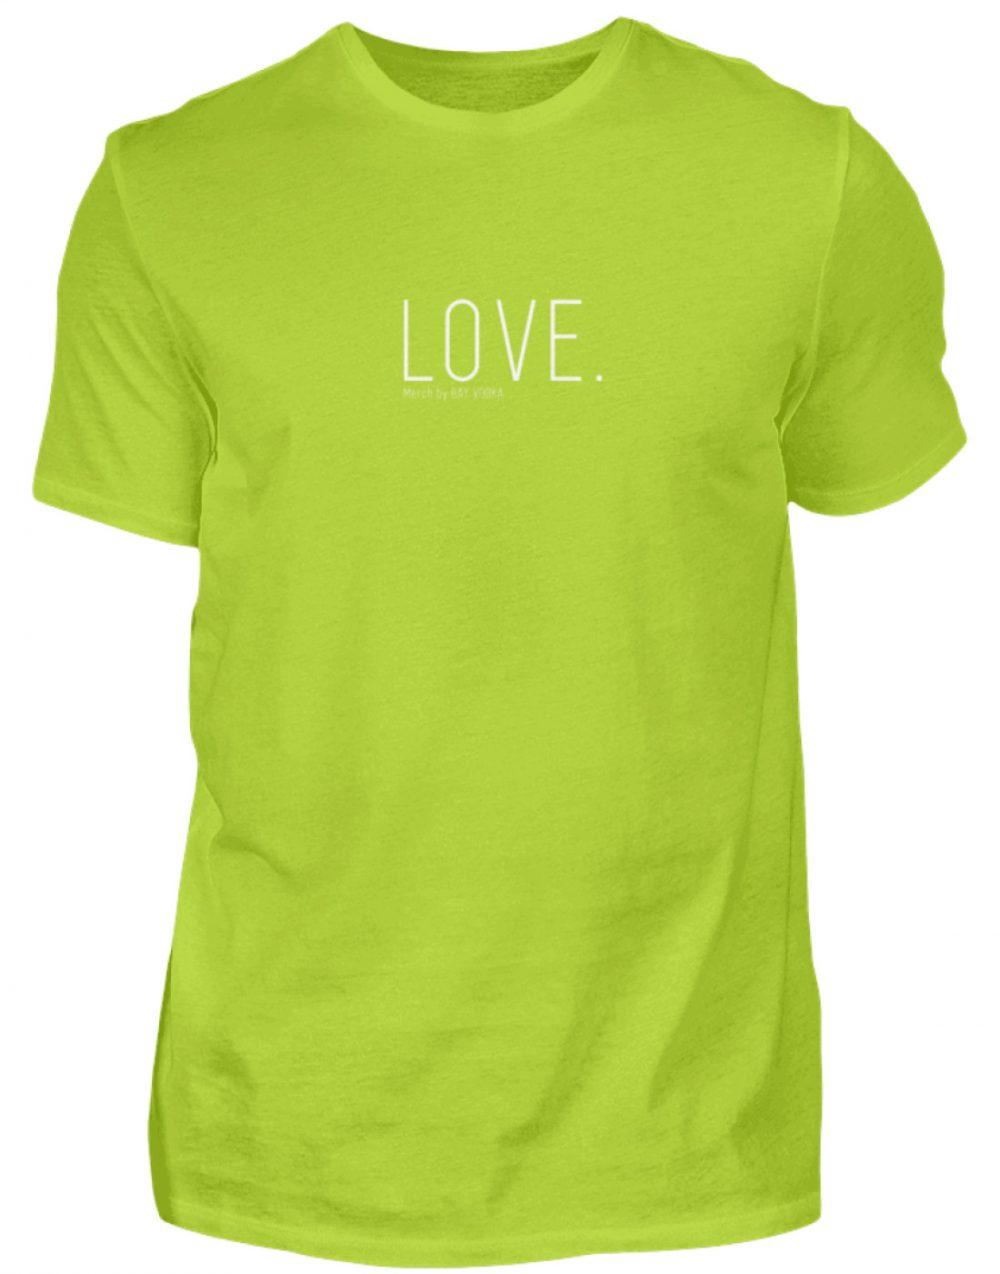 LOVE. - Herren Premiumshirt-2885